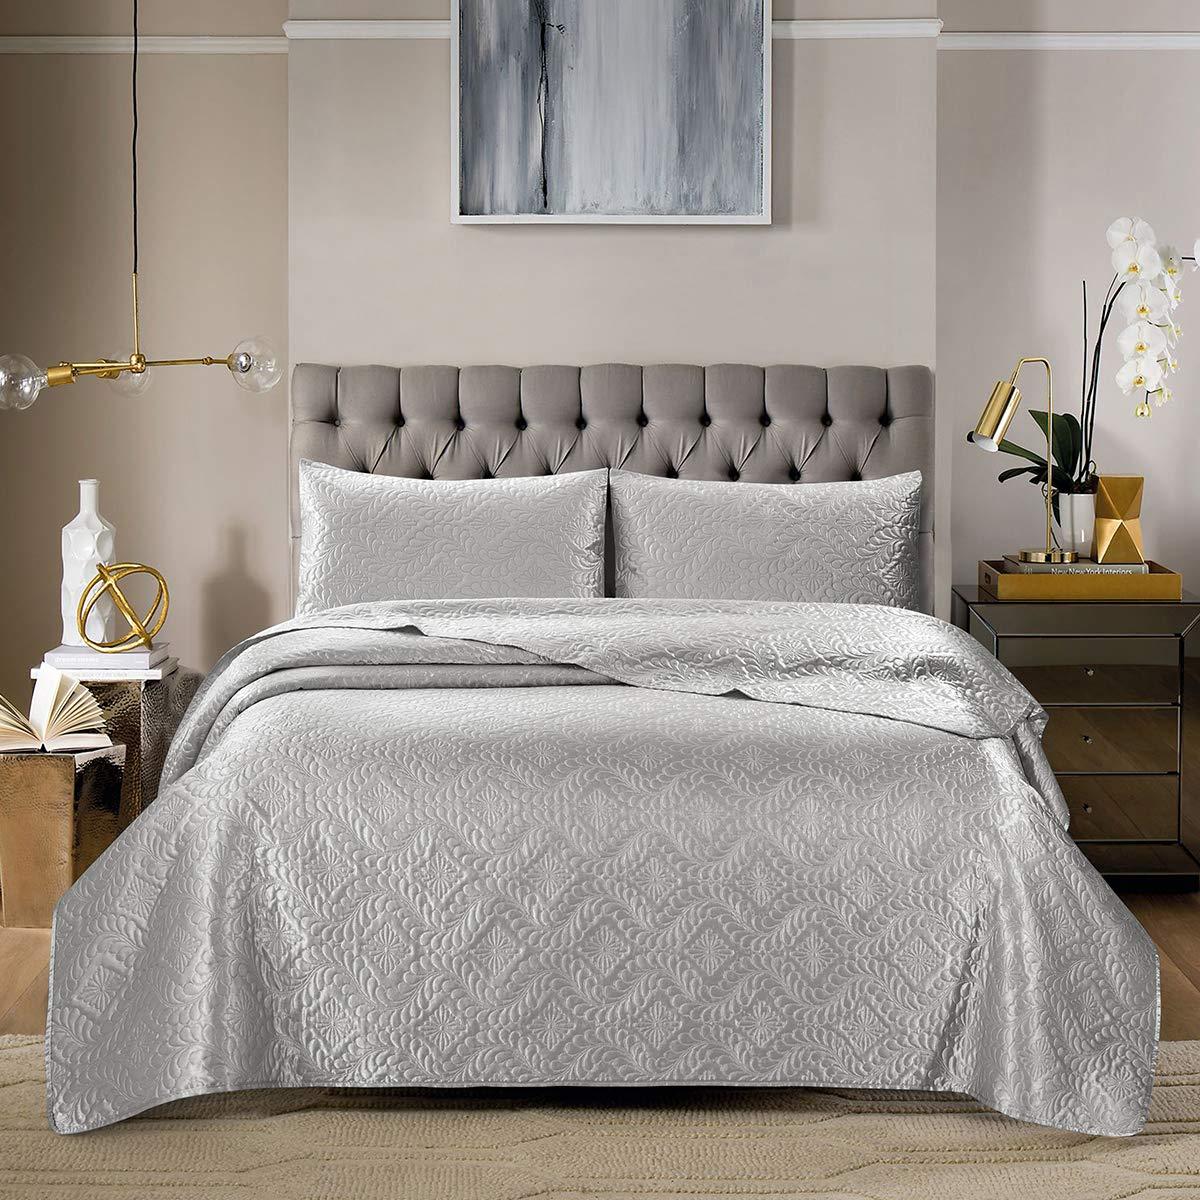 ARTALL King Size Bedspread Teal Blue Silky Super Soft 3 Piece Deep Pocket Satin Solid Bed Quilt Coverlet